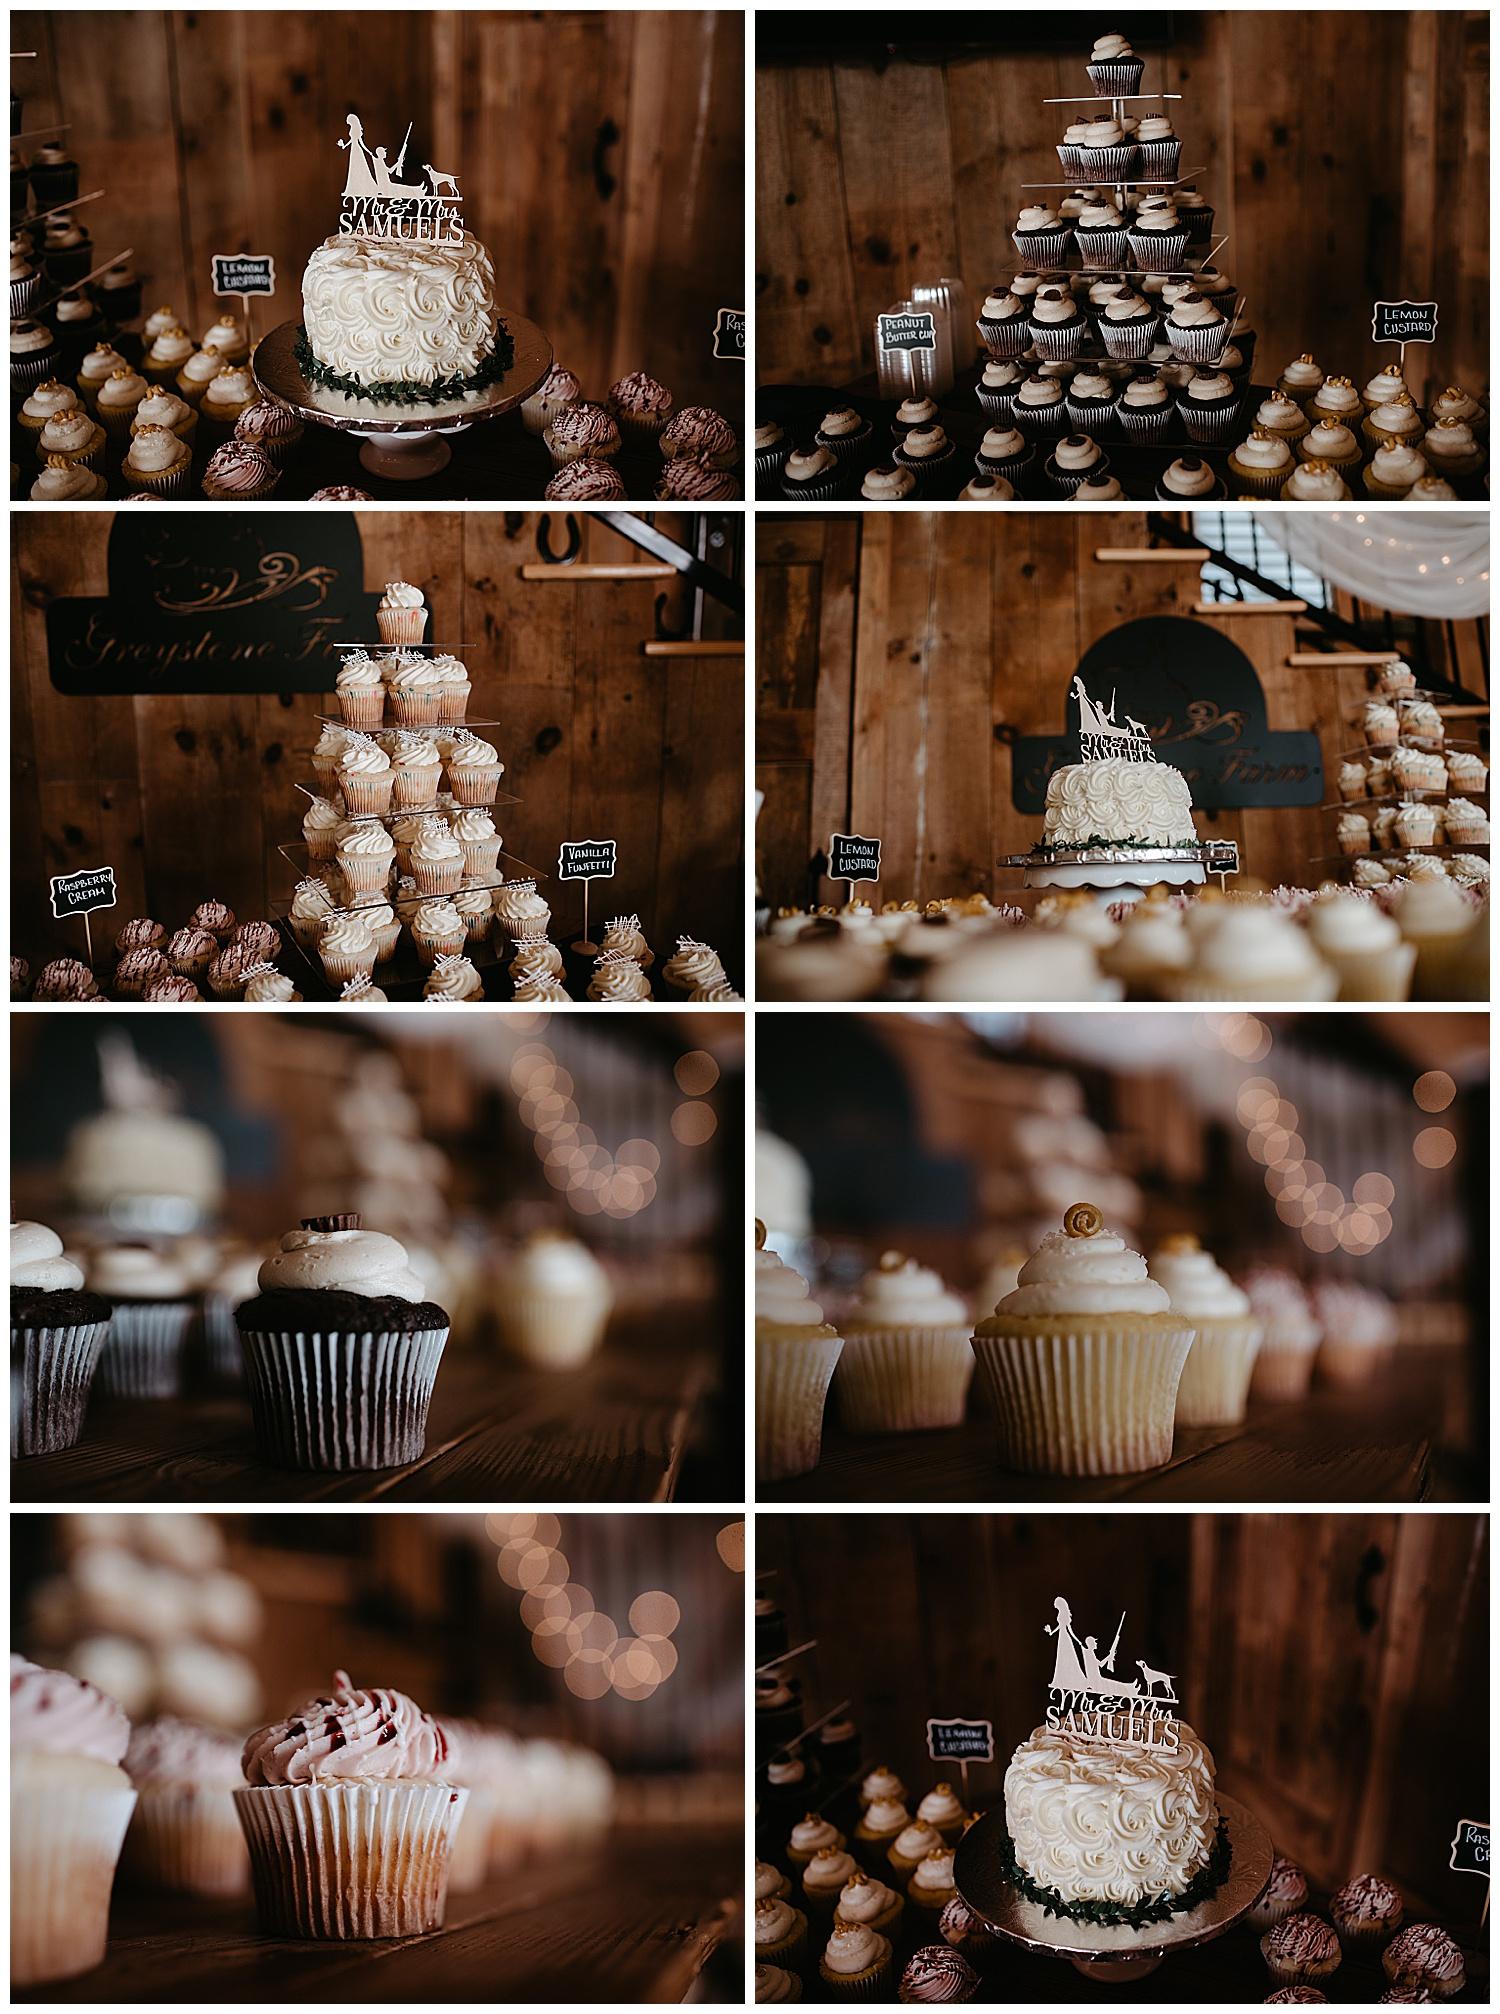 NEPA-Bloomgsburg-Wedding-Photographer-at-The-Barn-at-Greystone-Farms-Watsontown-PA_0086.jpg